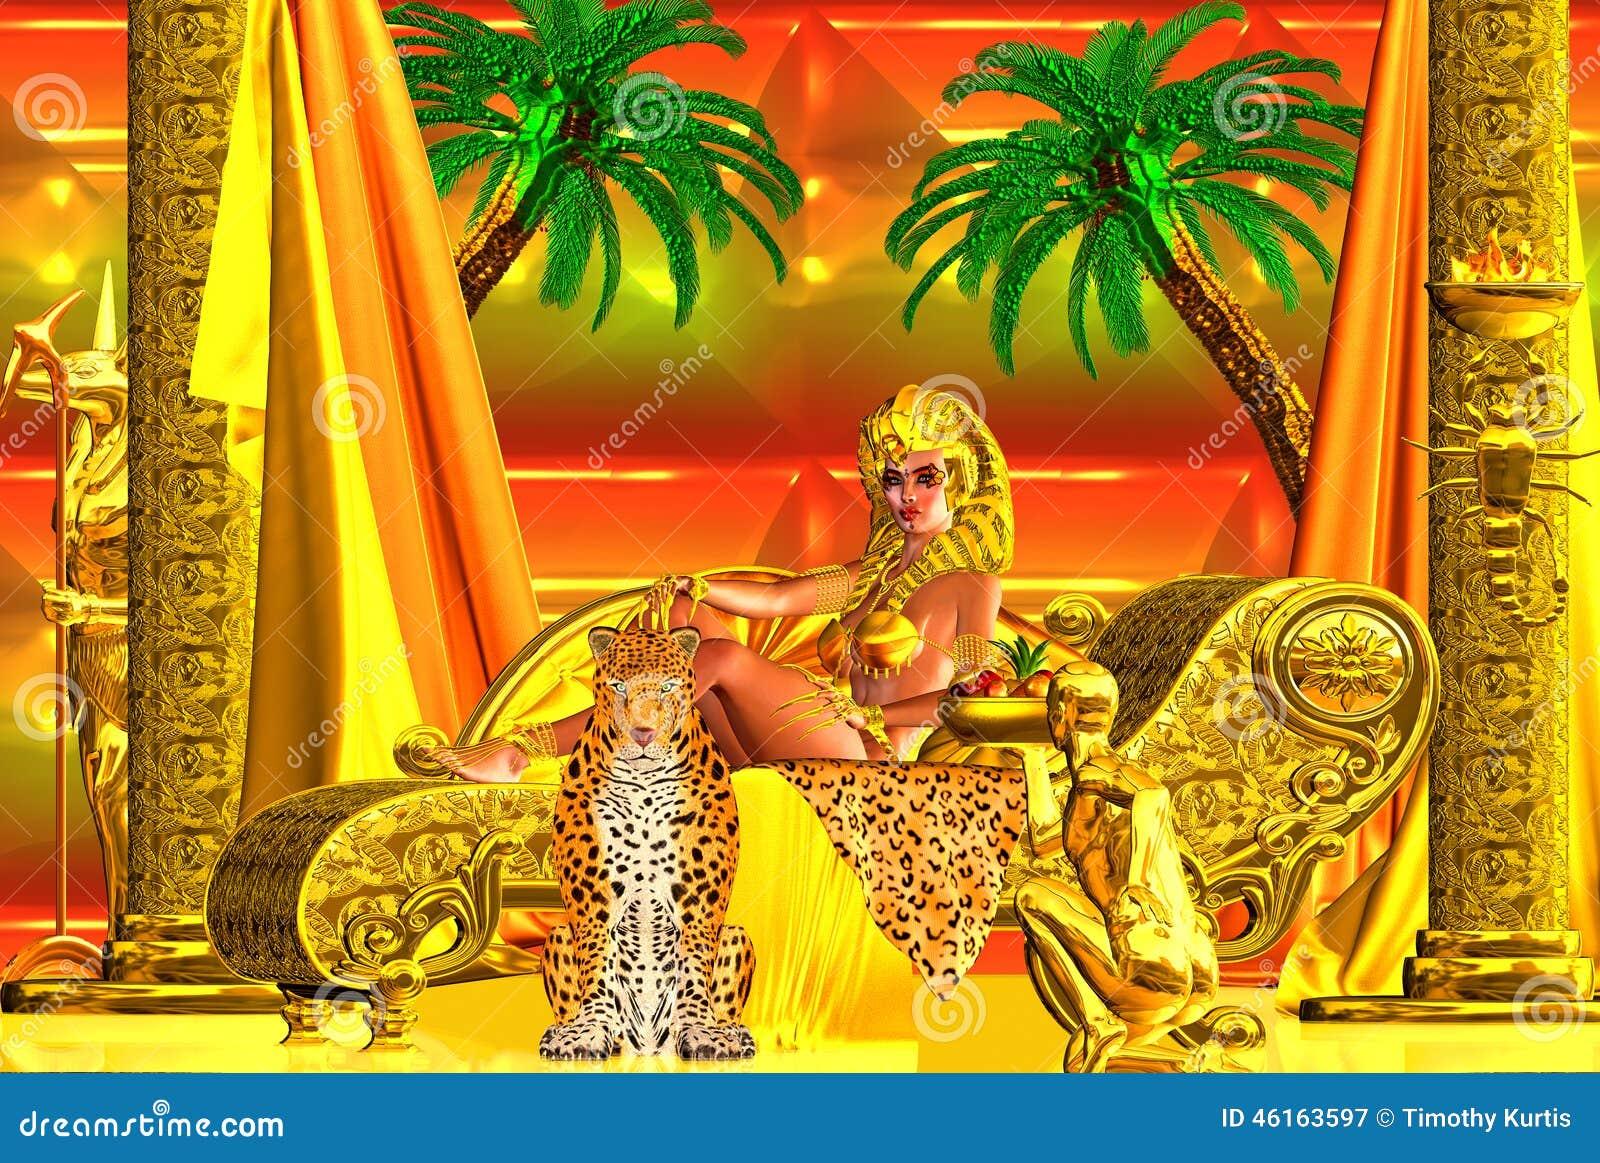 A Beautiful Egyptian Goddess Lying Down A Chaise Lounge Stock Illustration Image